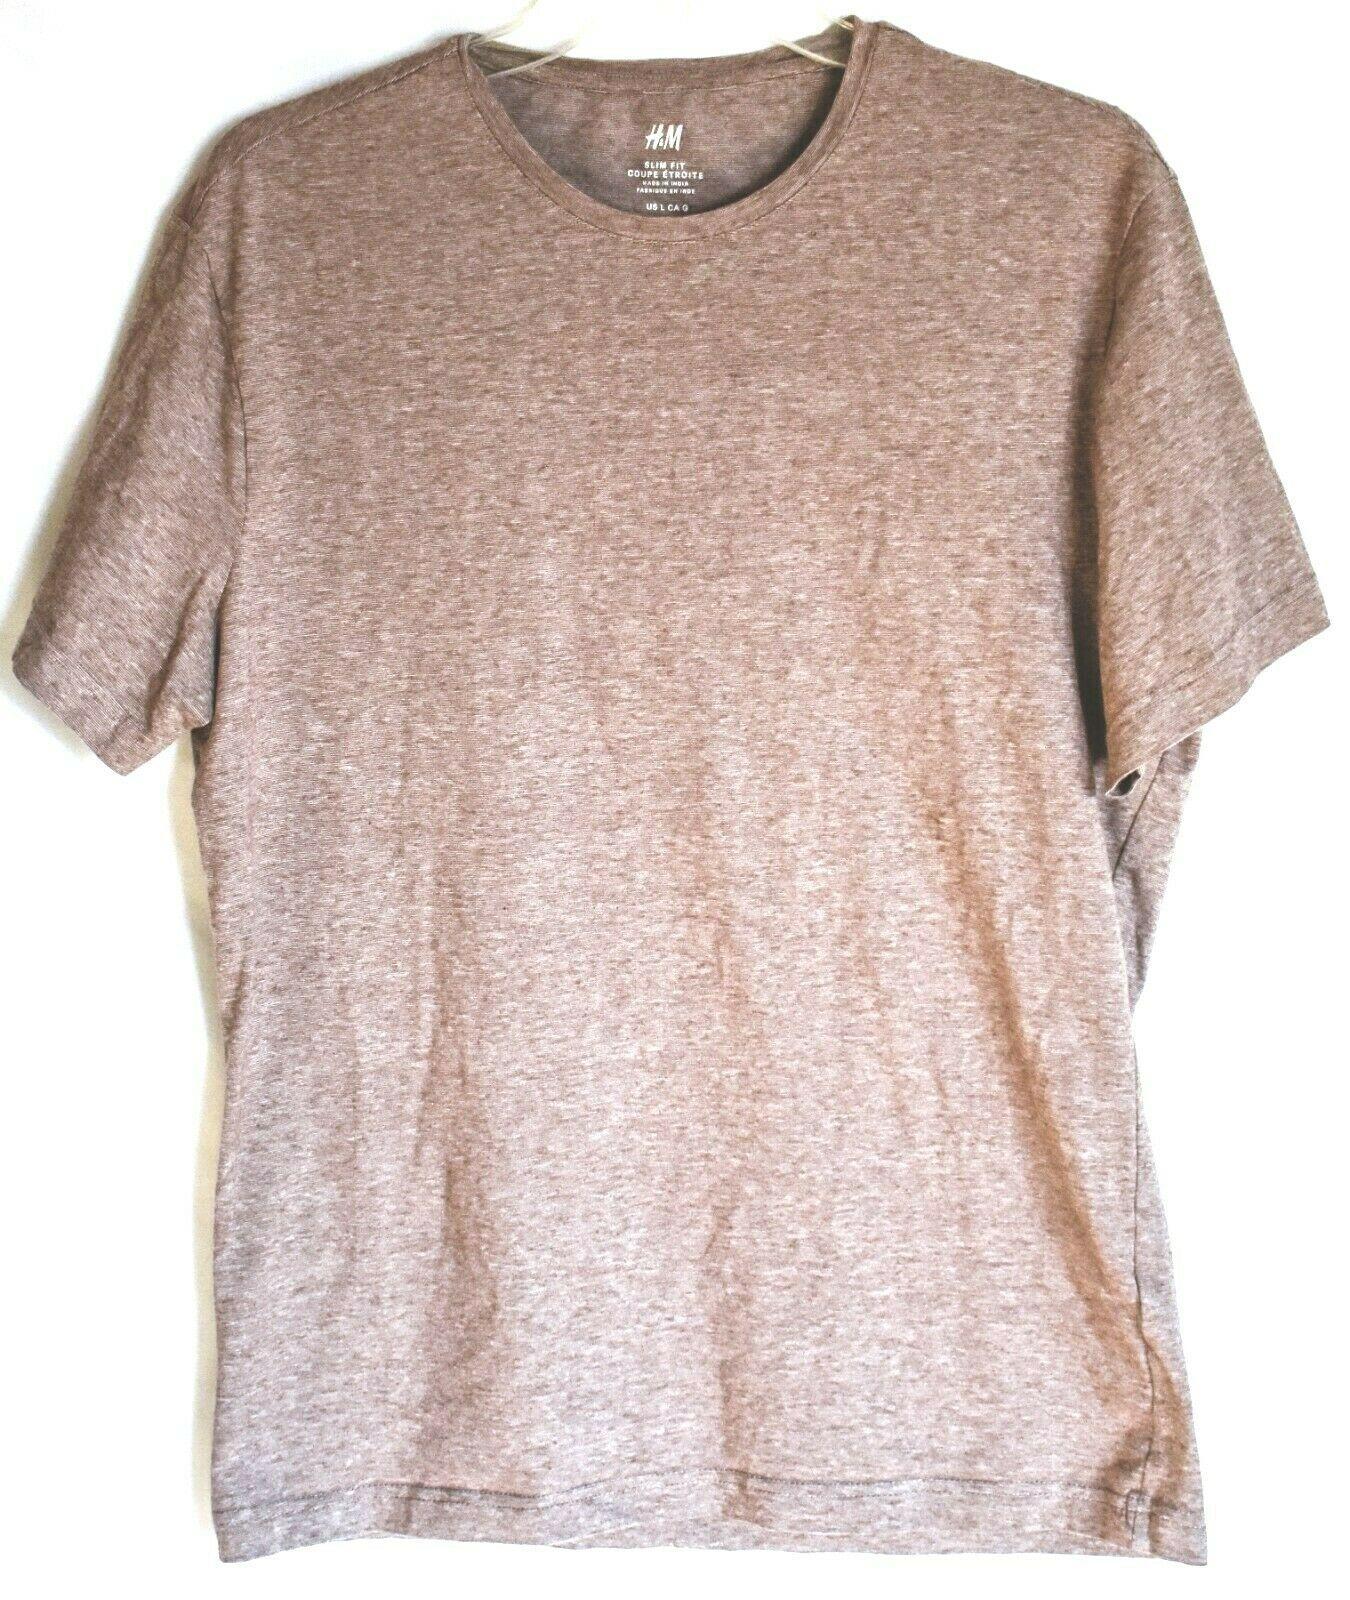 H&M Men's Slim Fit Heathered Brown Crew Neck T-Shirt Size L